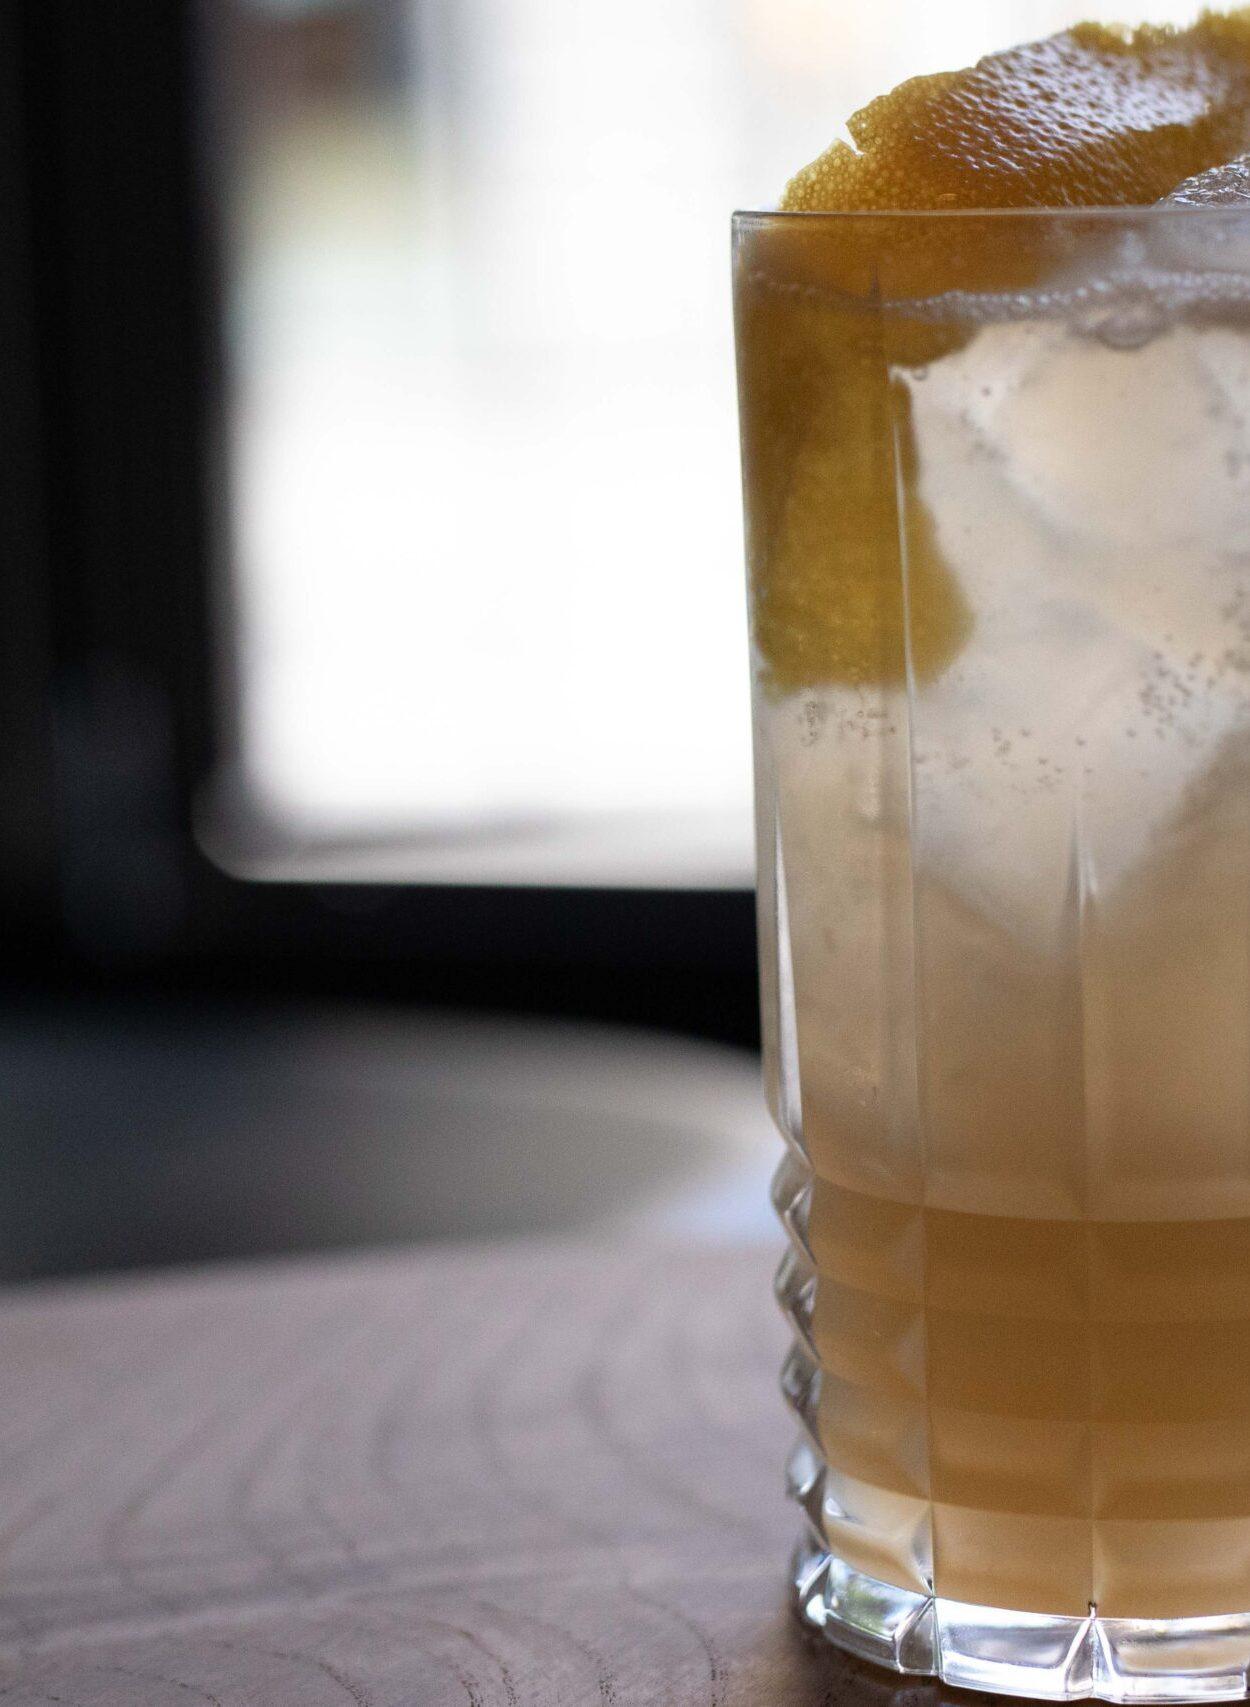 Italian_Lemonade / Fotograf Luzern